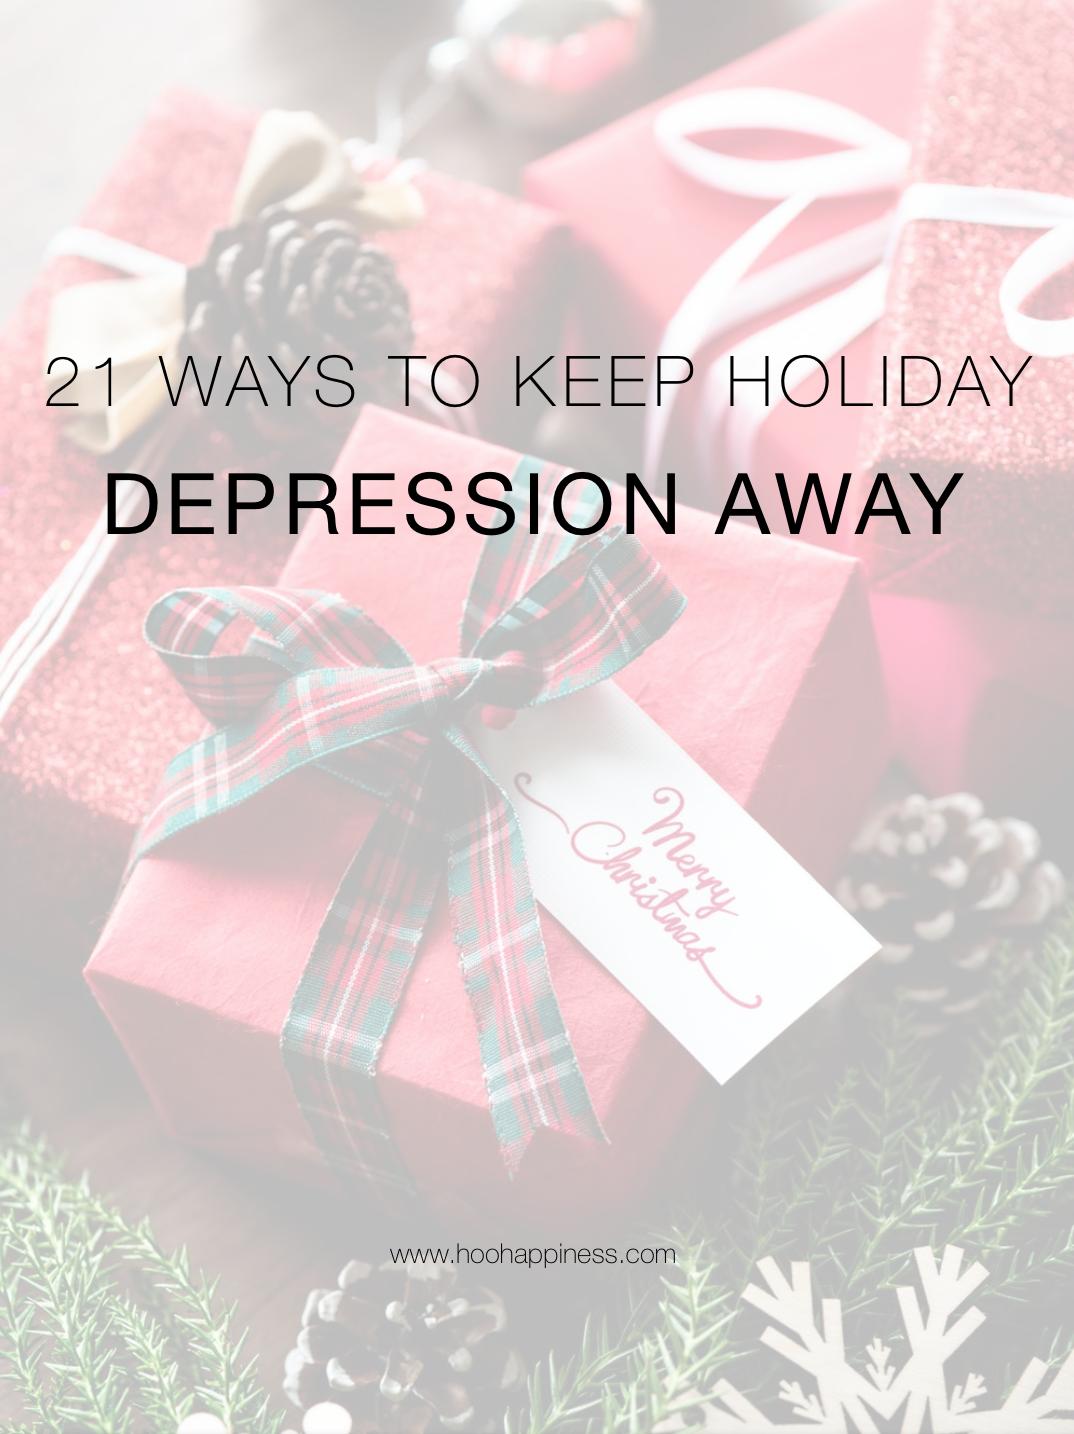 21 Ways to Keep Depression Away